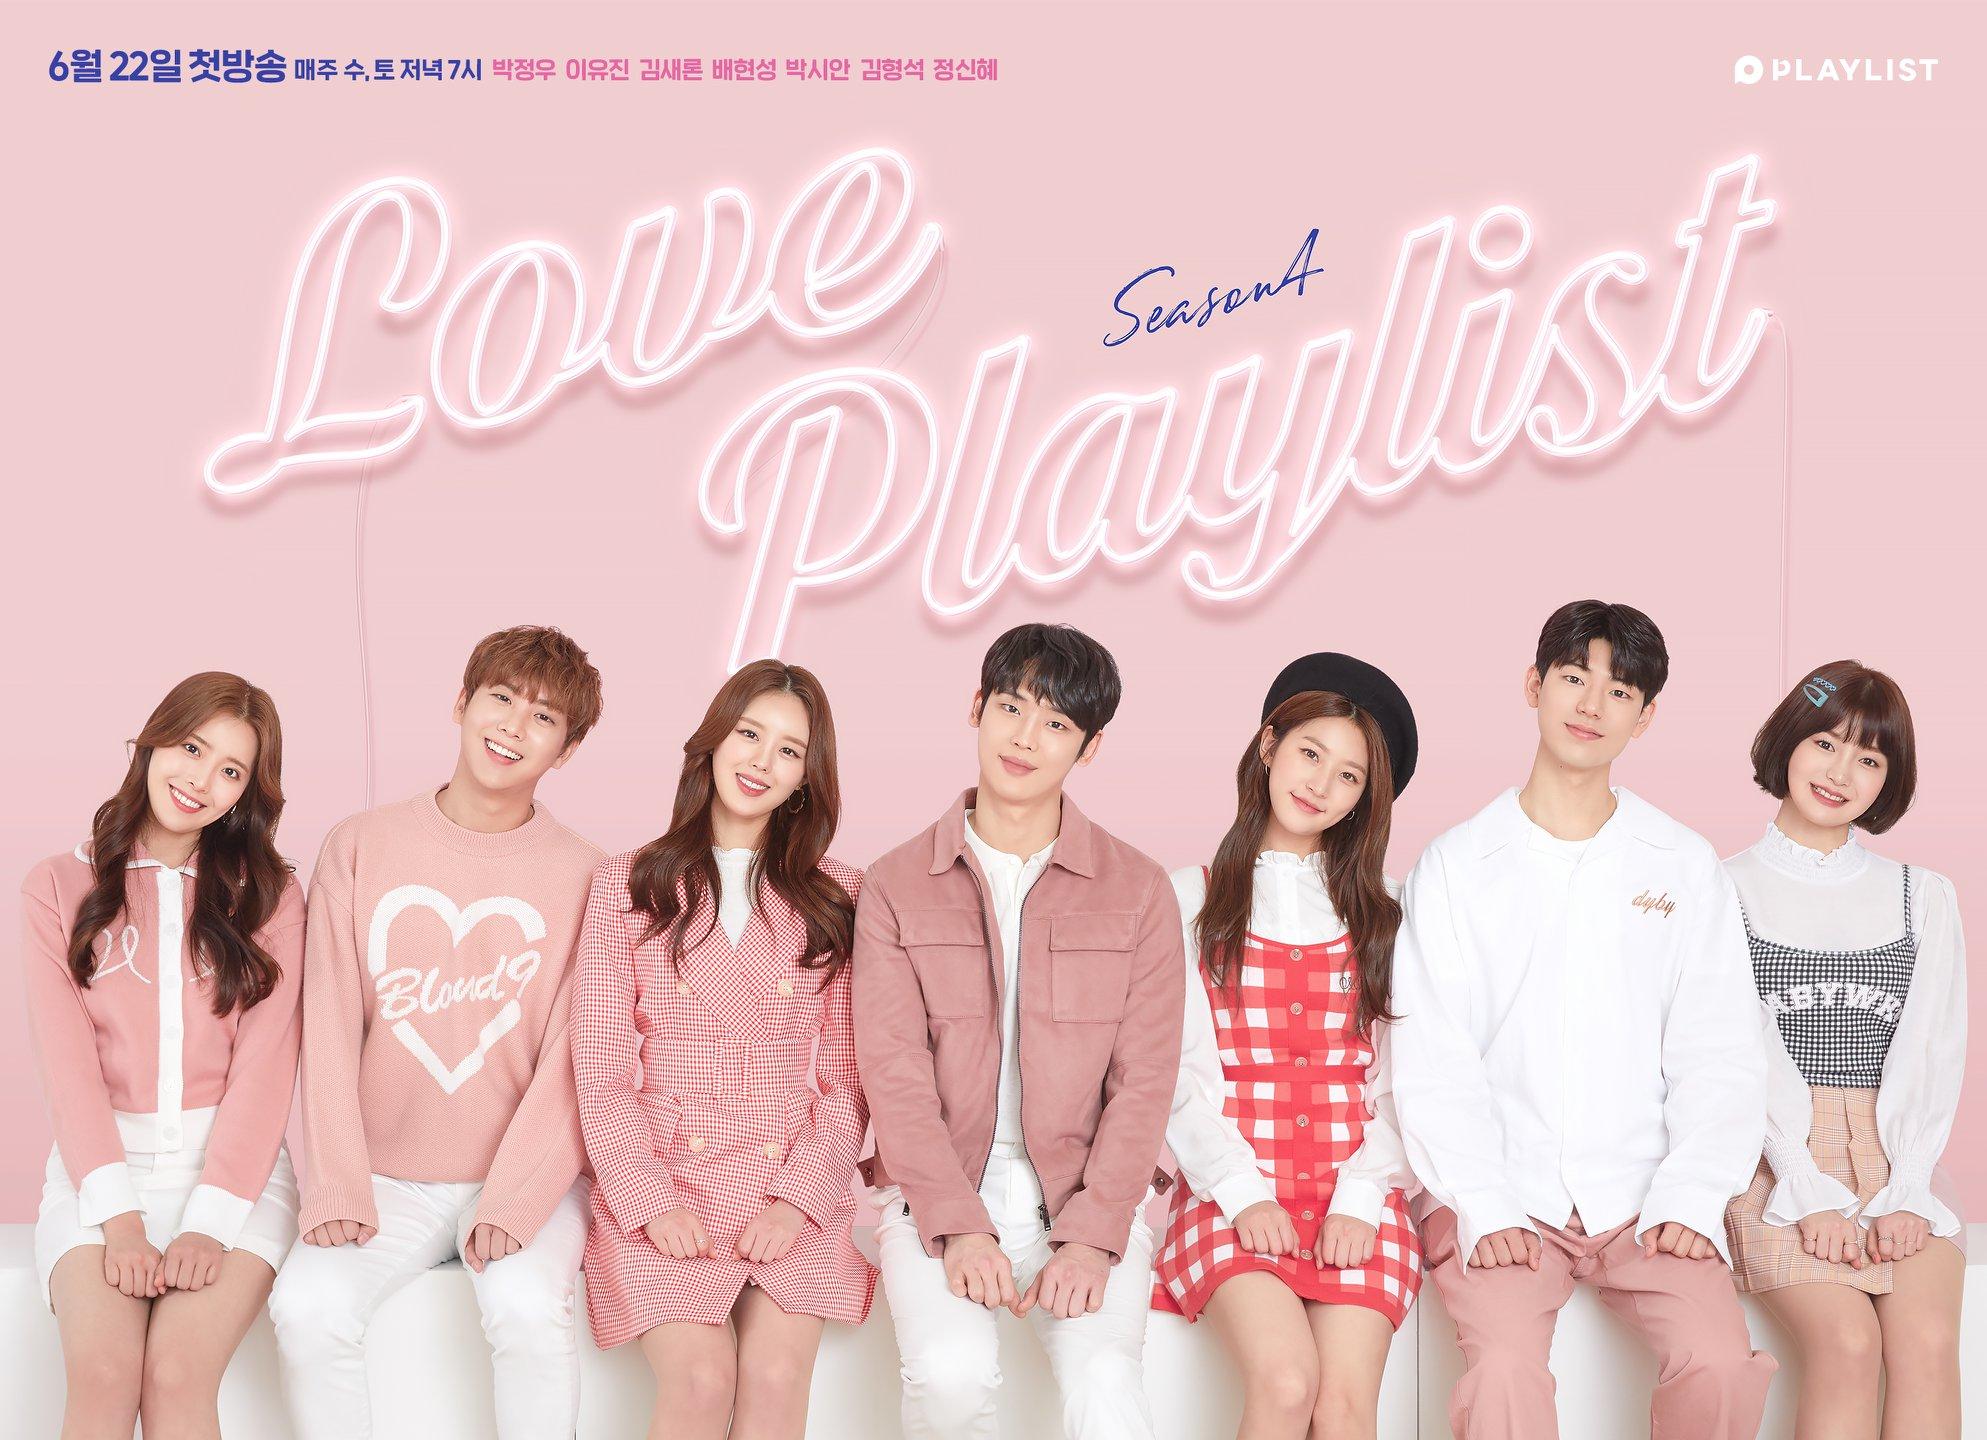 Love Playlist 4 drama, Love Playlist 4 cast, Love Playlist 4 summary, web drama playlist, web drama love playlist, kim saeron 2019, kim saeron drama